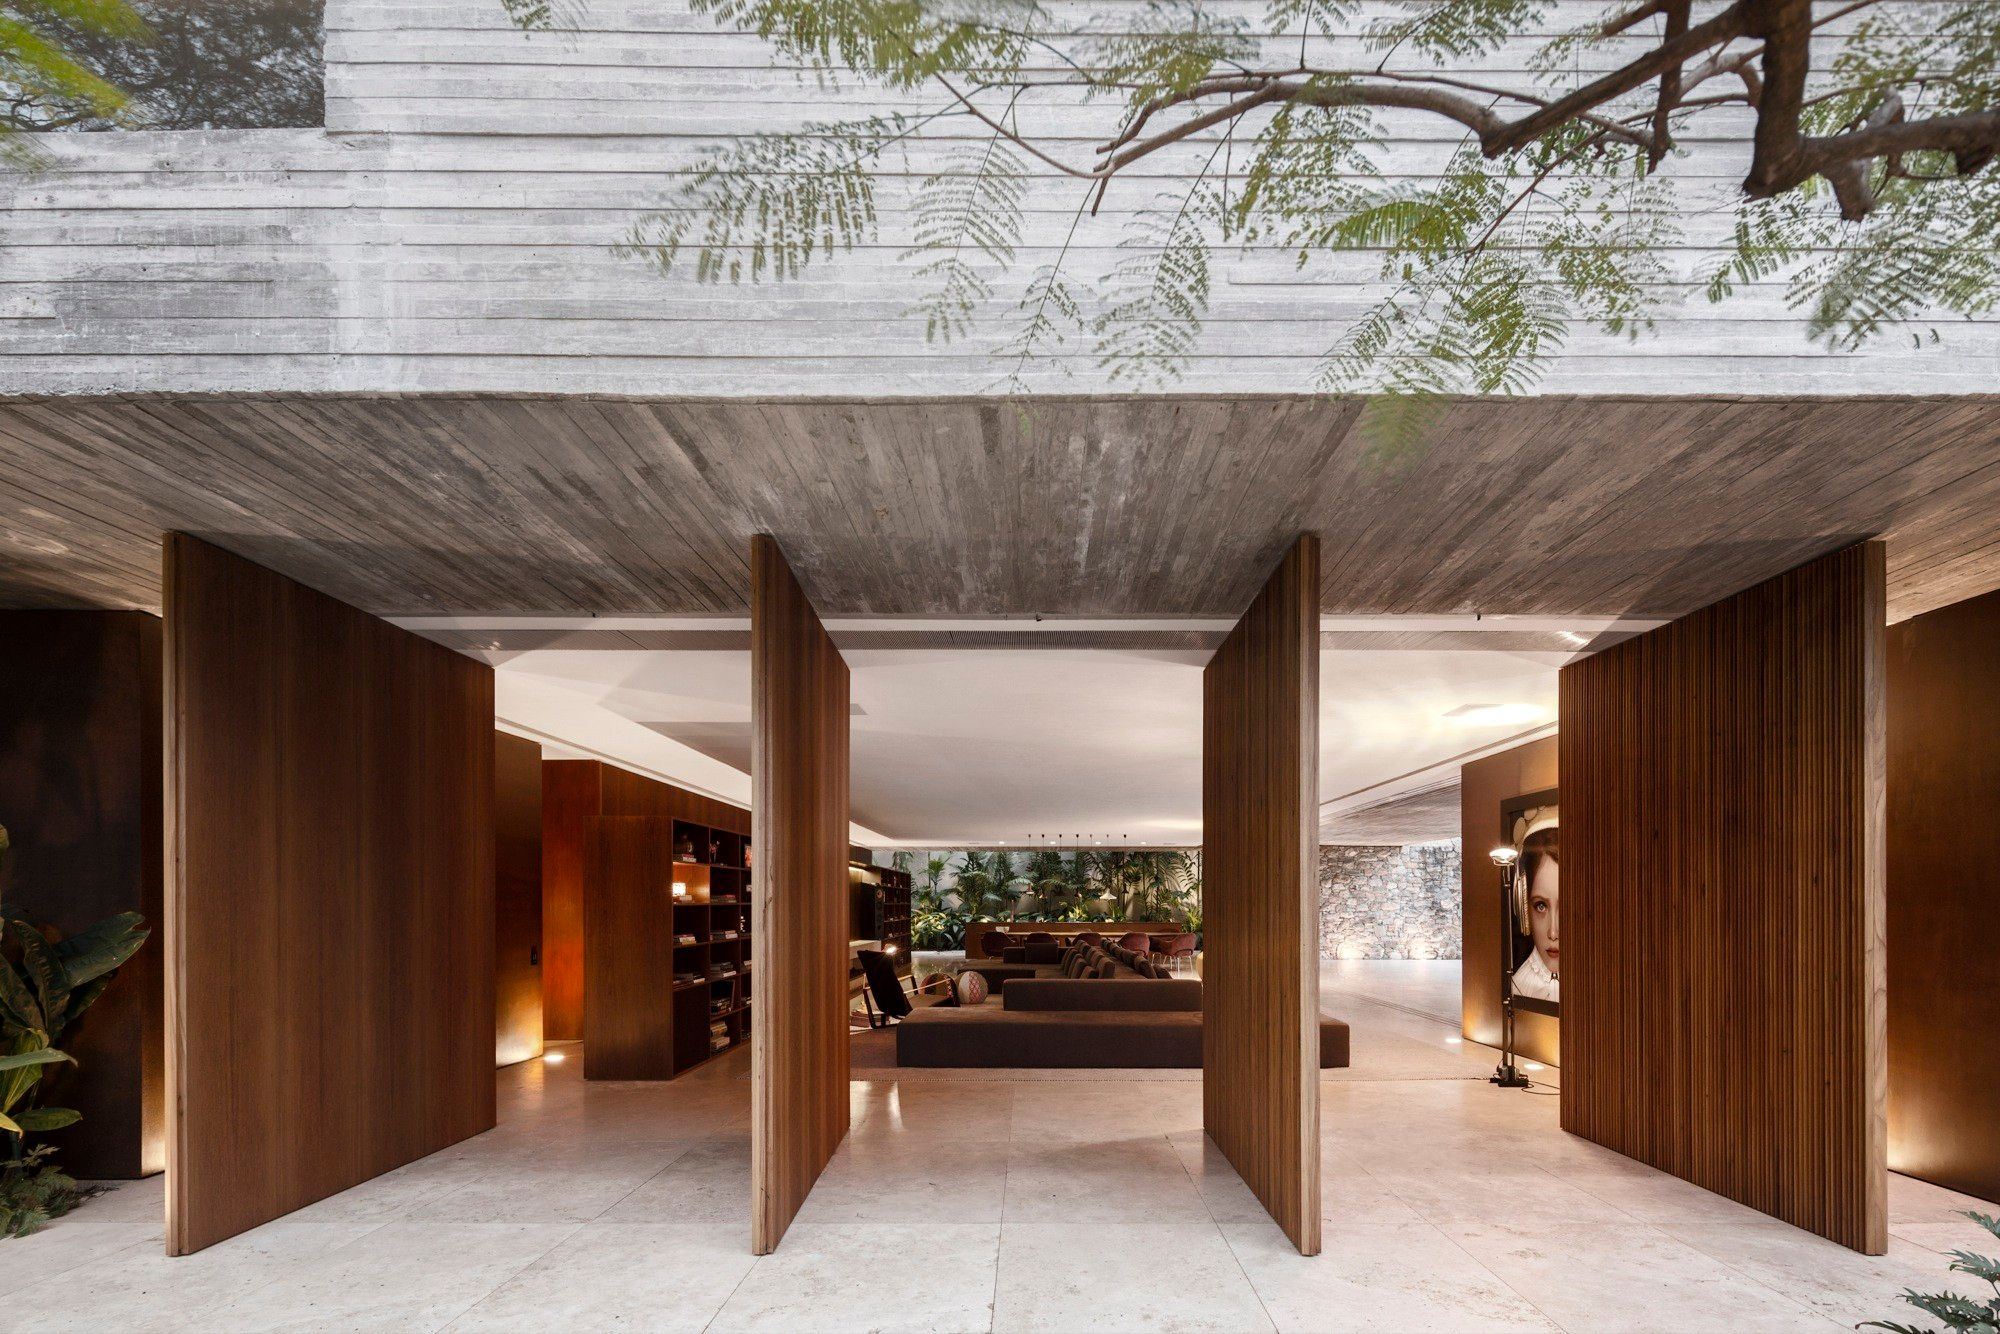 Ipes House by Studio MK27